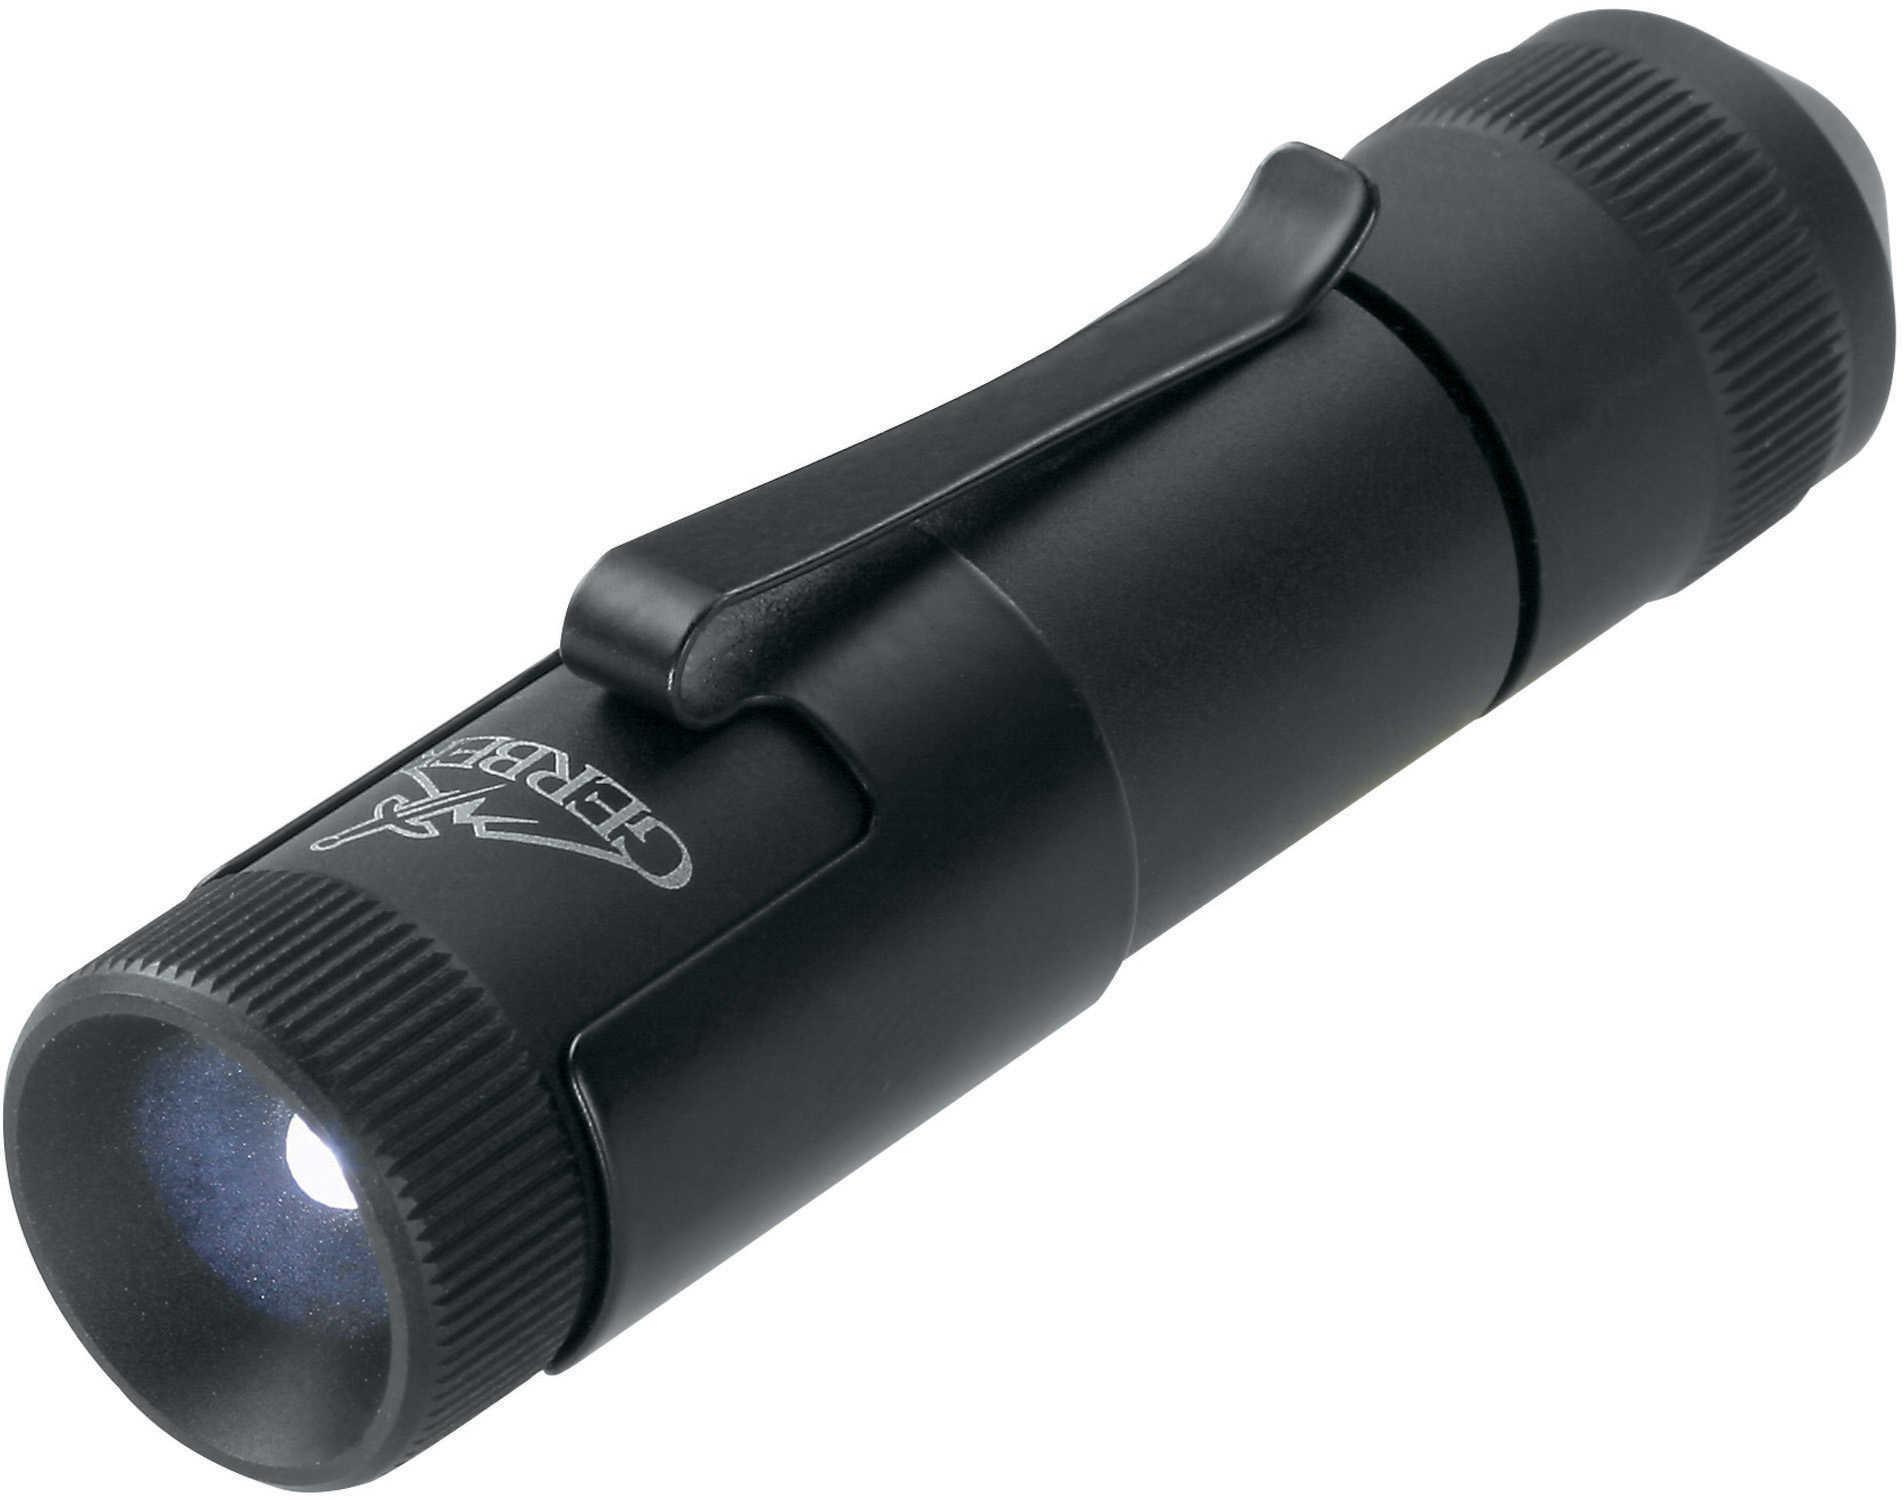 Gerber Infinity UltraTask Light Md: 22-80012